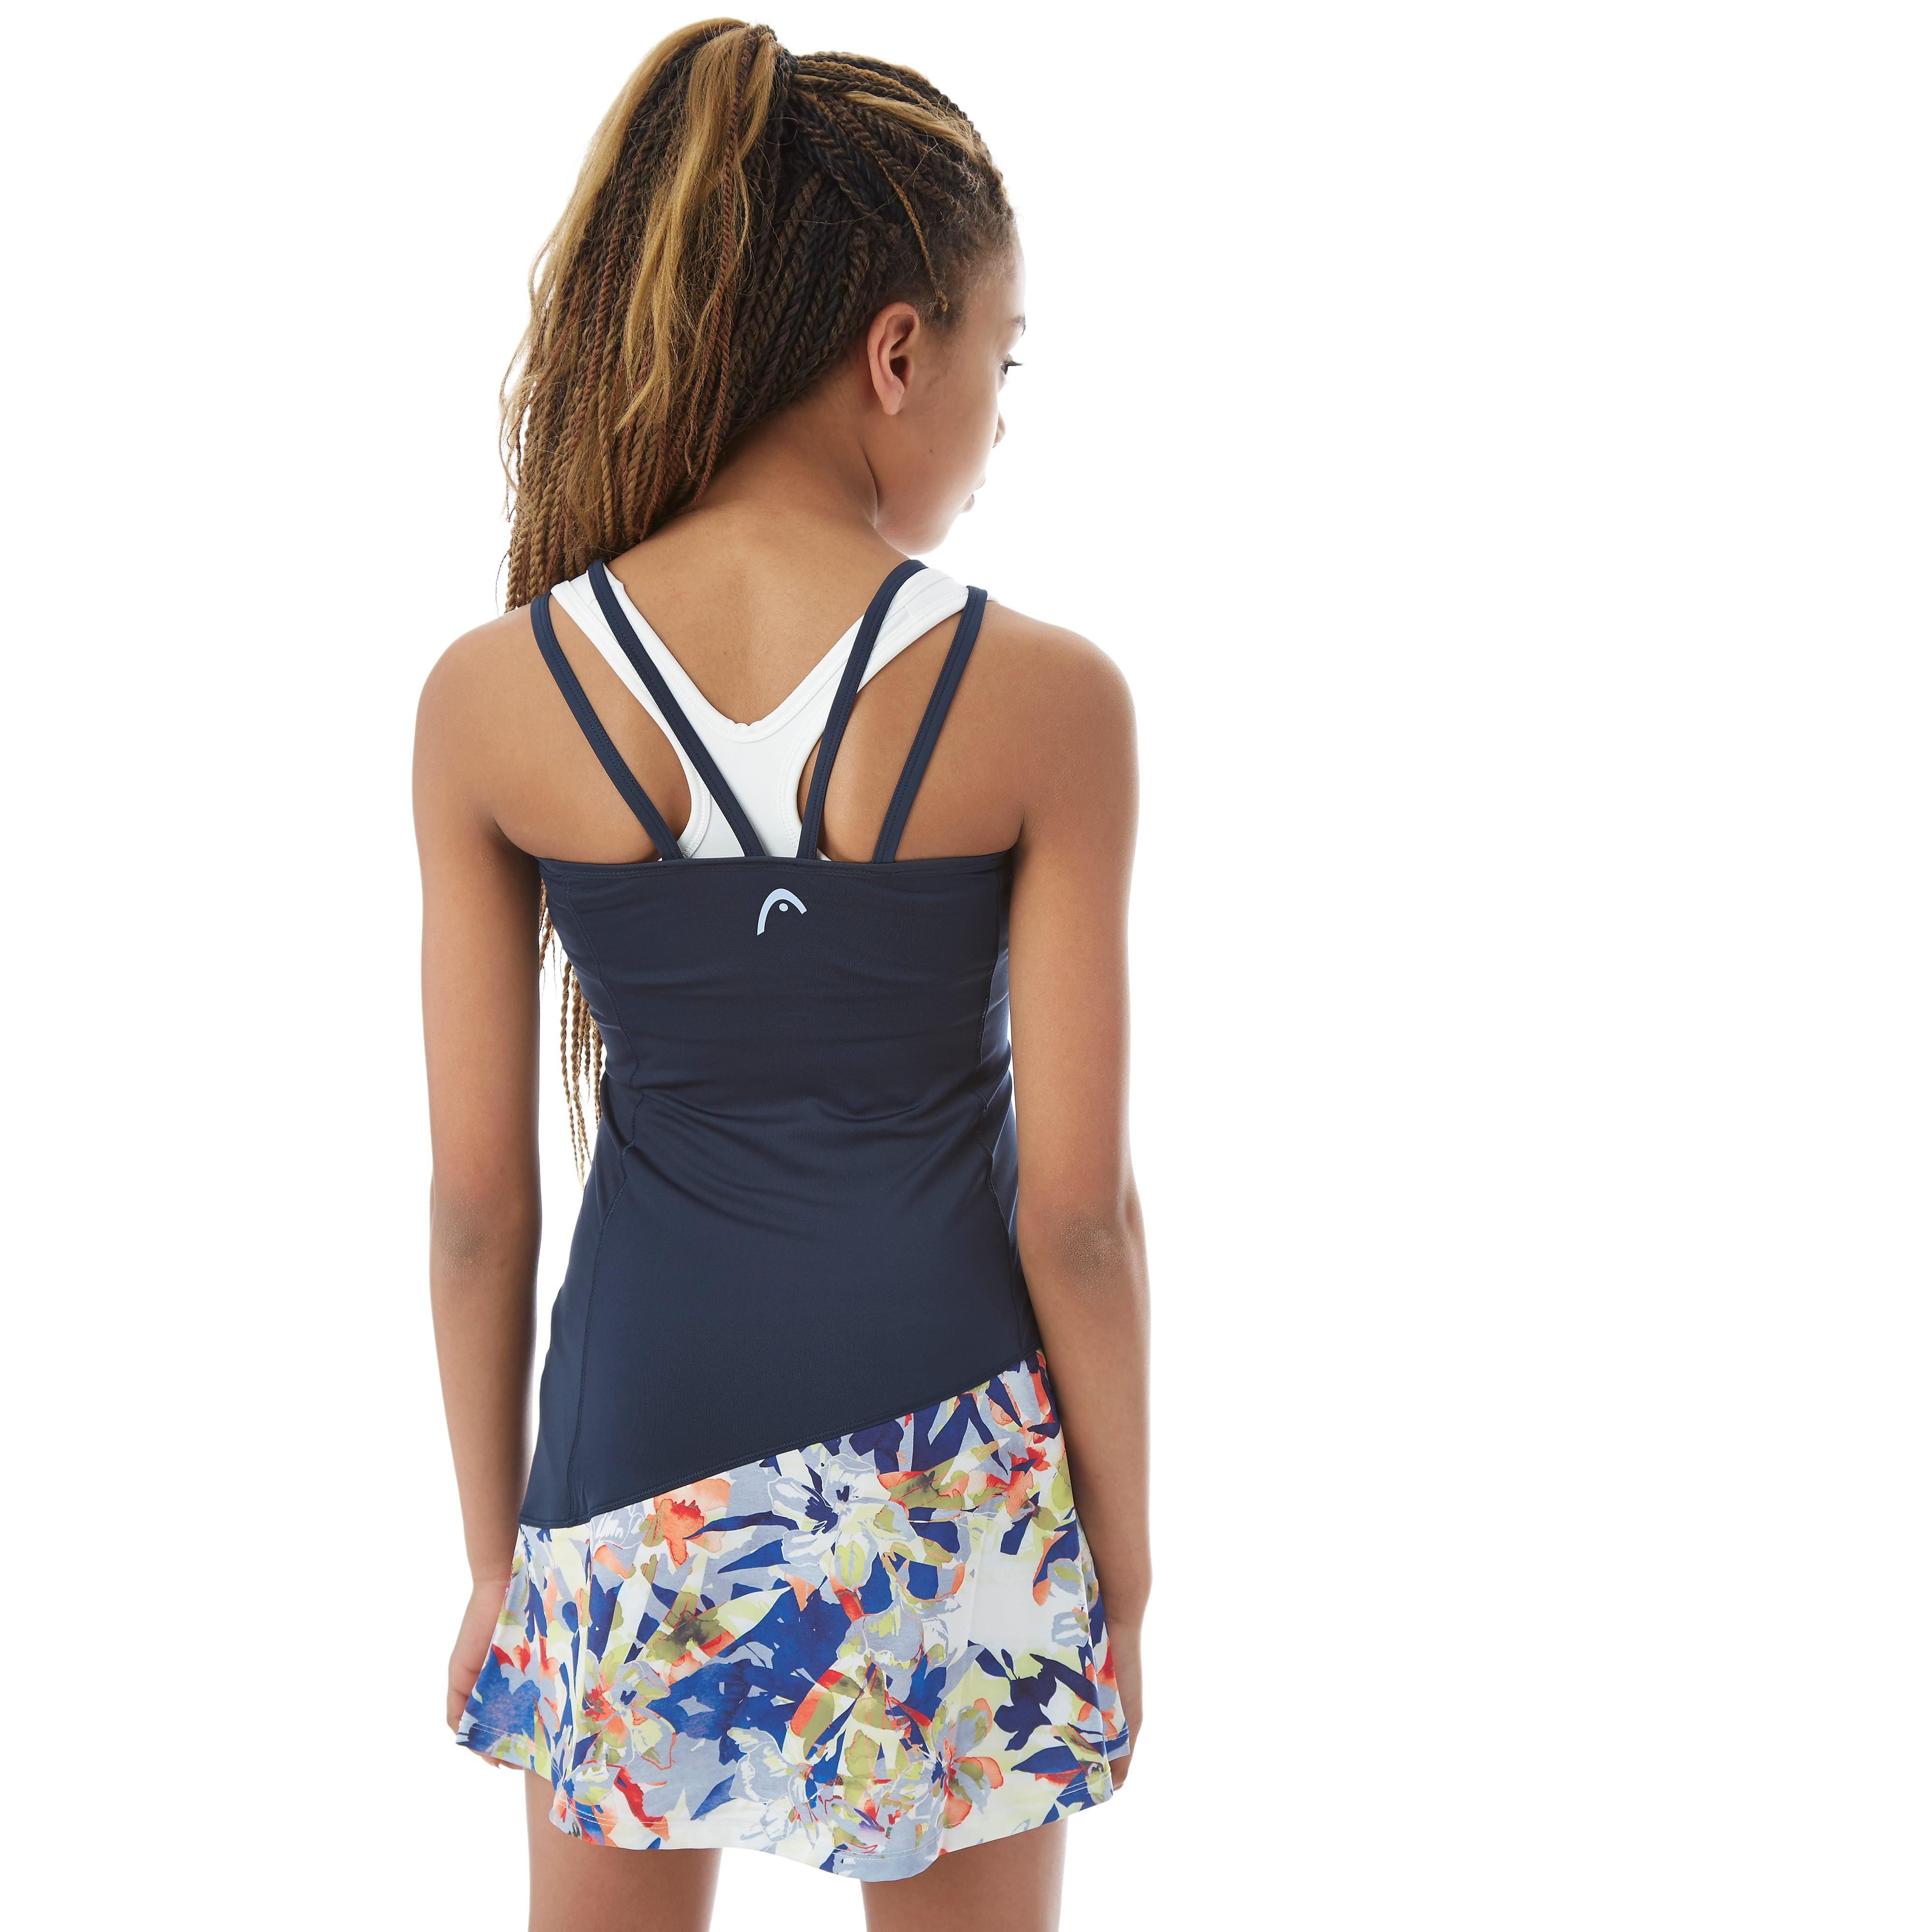 Head Vision Graphic Junior Tennis Dress